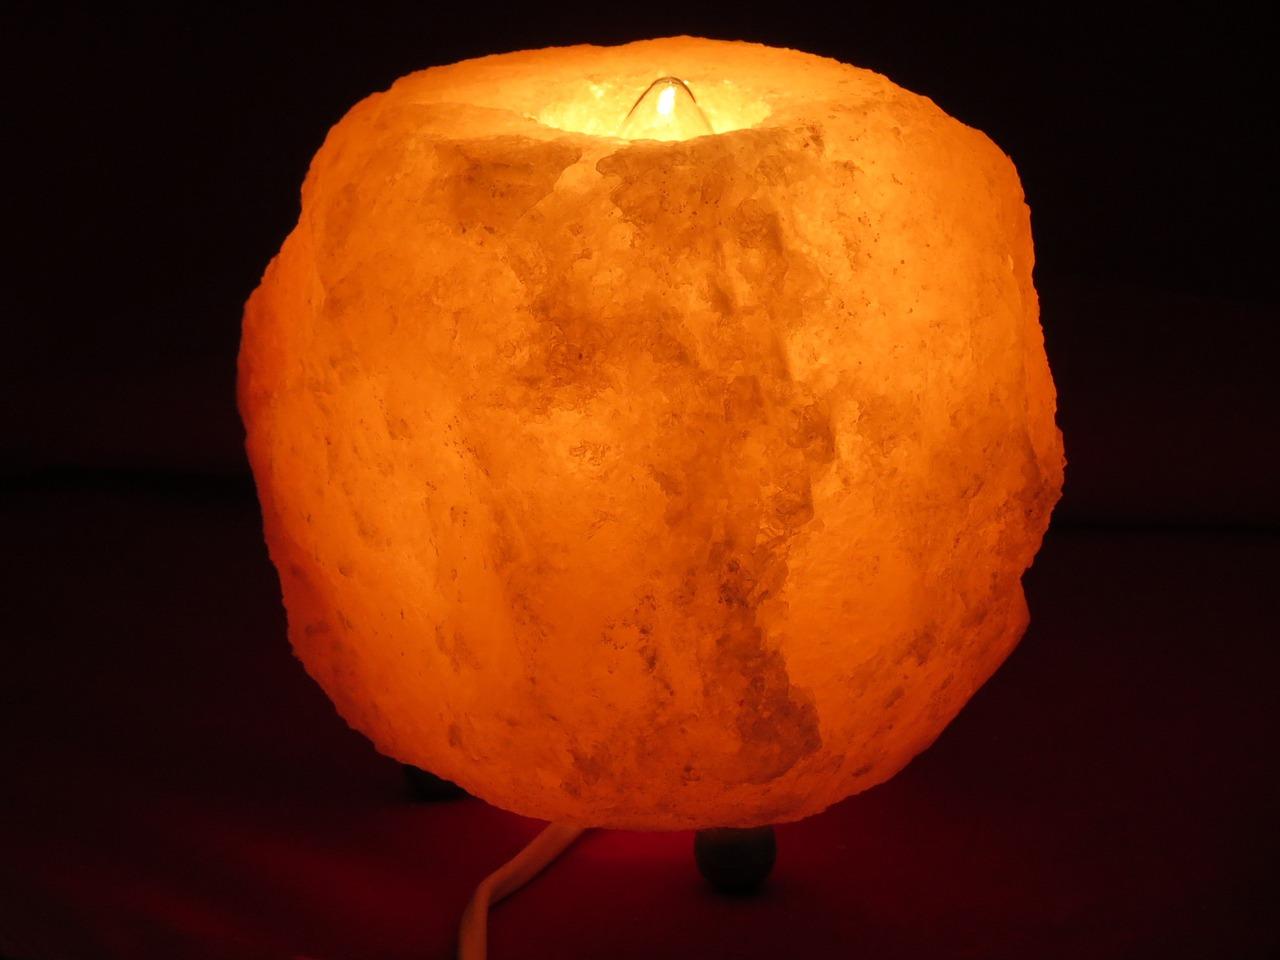 salt-lamp-768035_1280.jpg